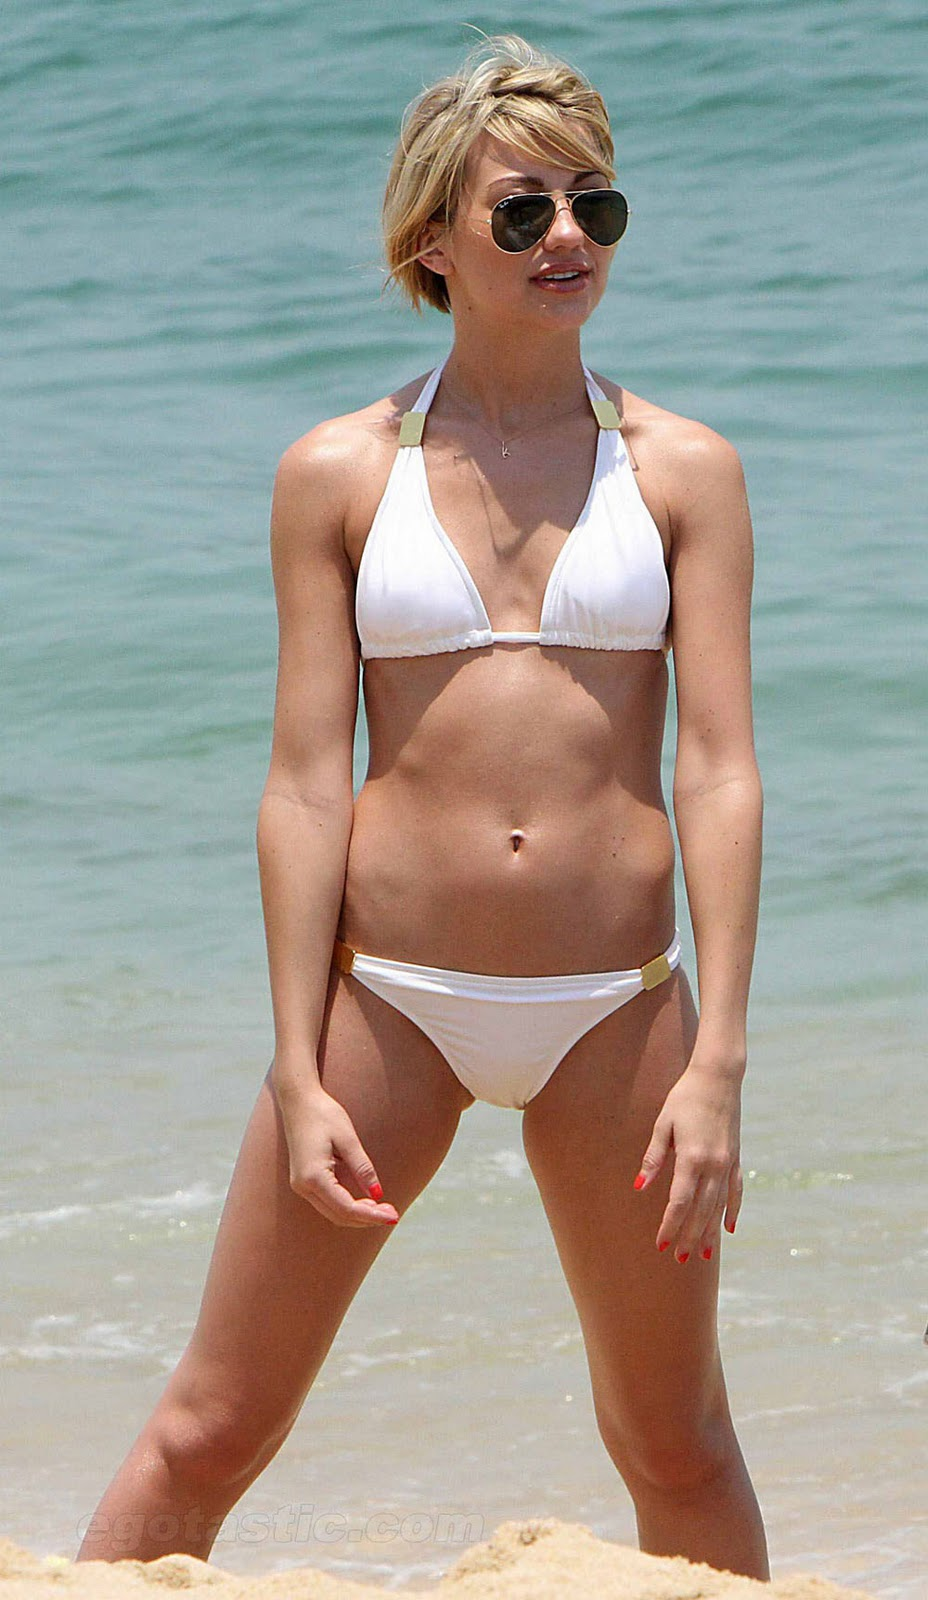 Sexy Bikini Pics Of Chelsea Kane Hot Actress Sexy Pics Sexy Girl And Car Photos